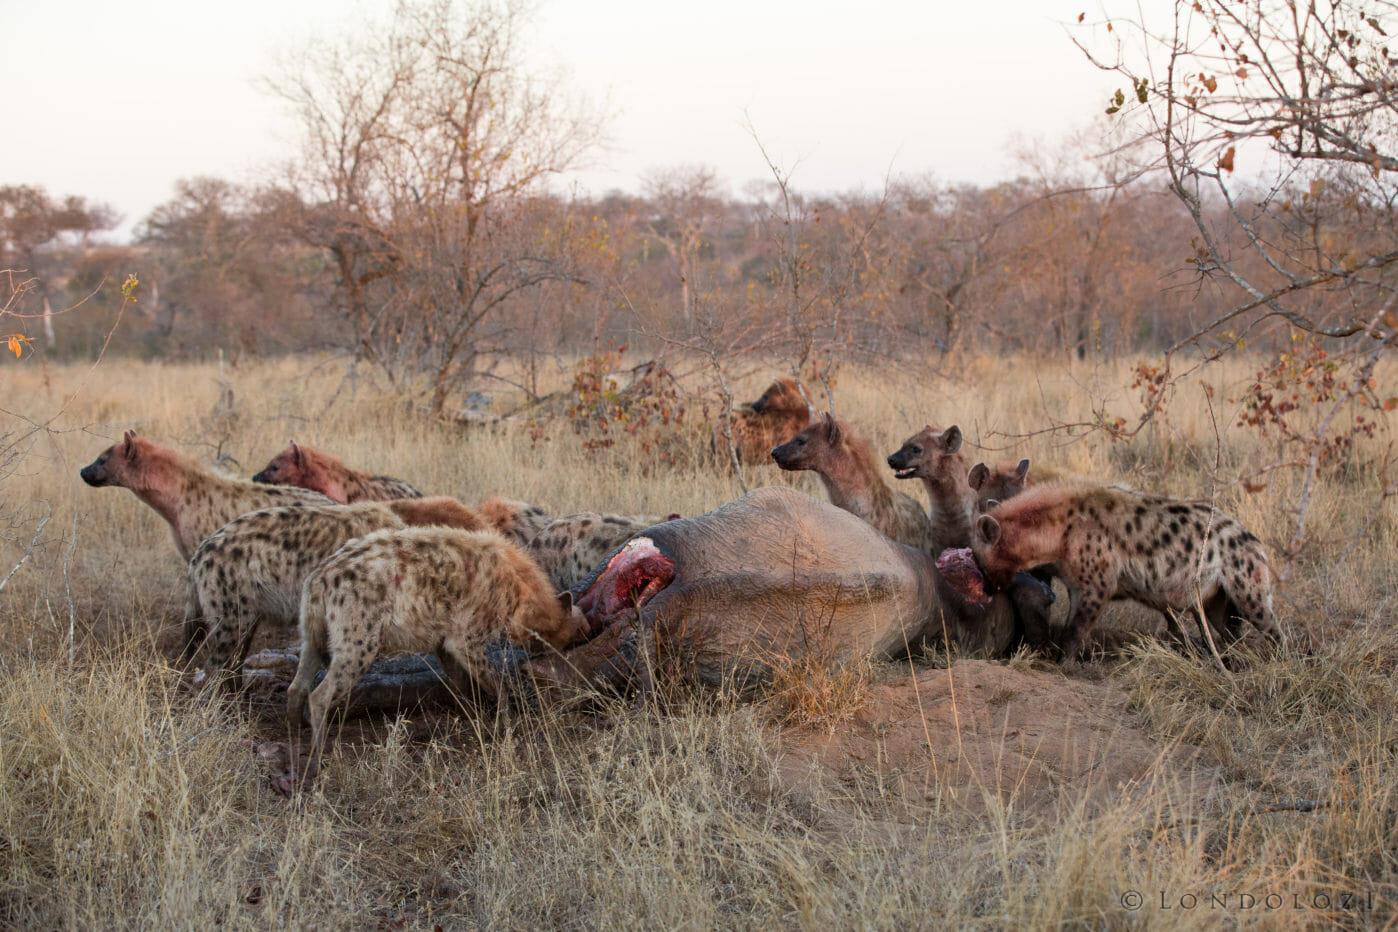 Hyenas Together Elephant